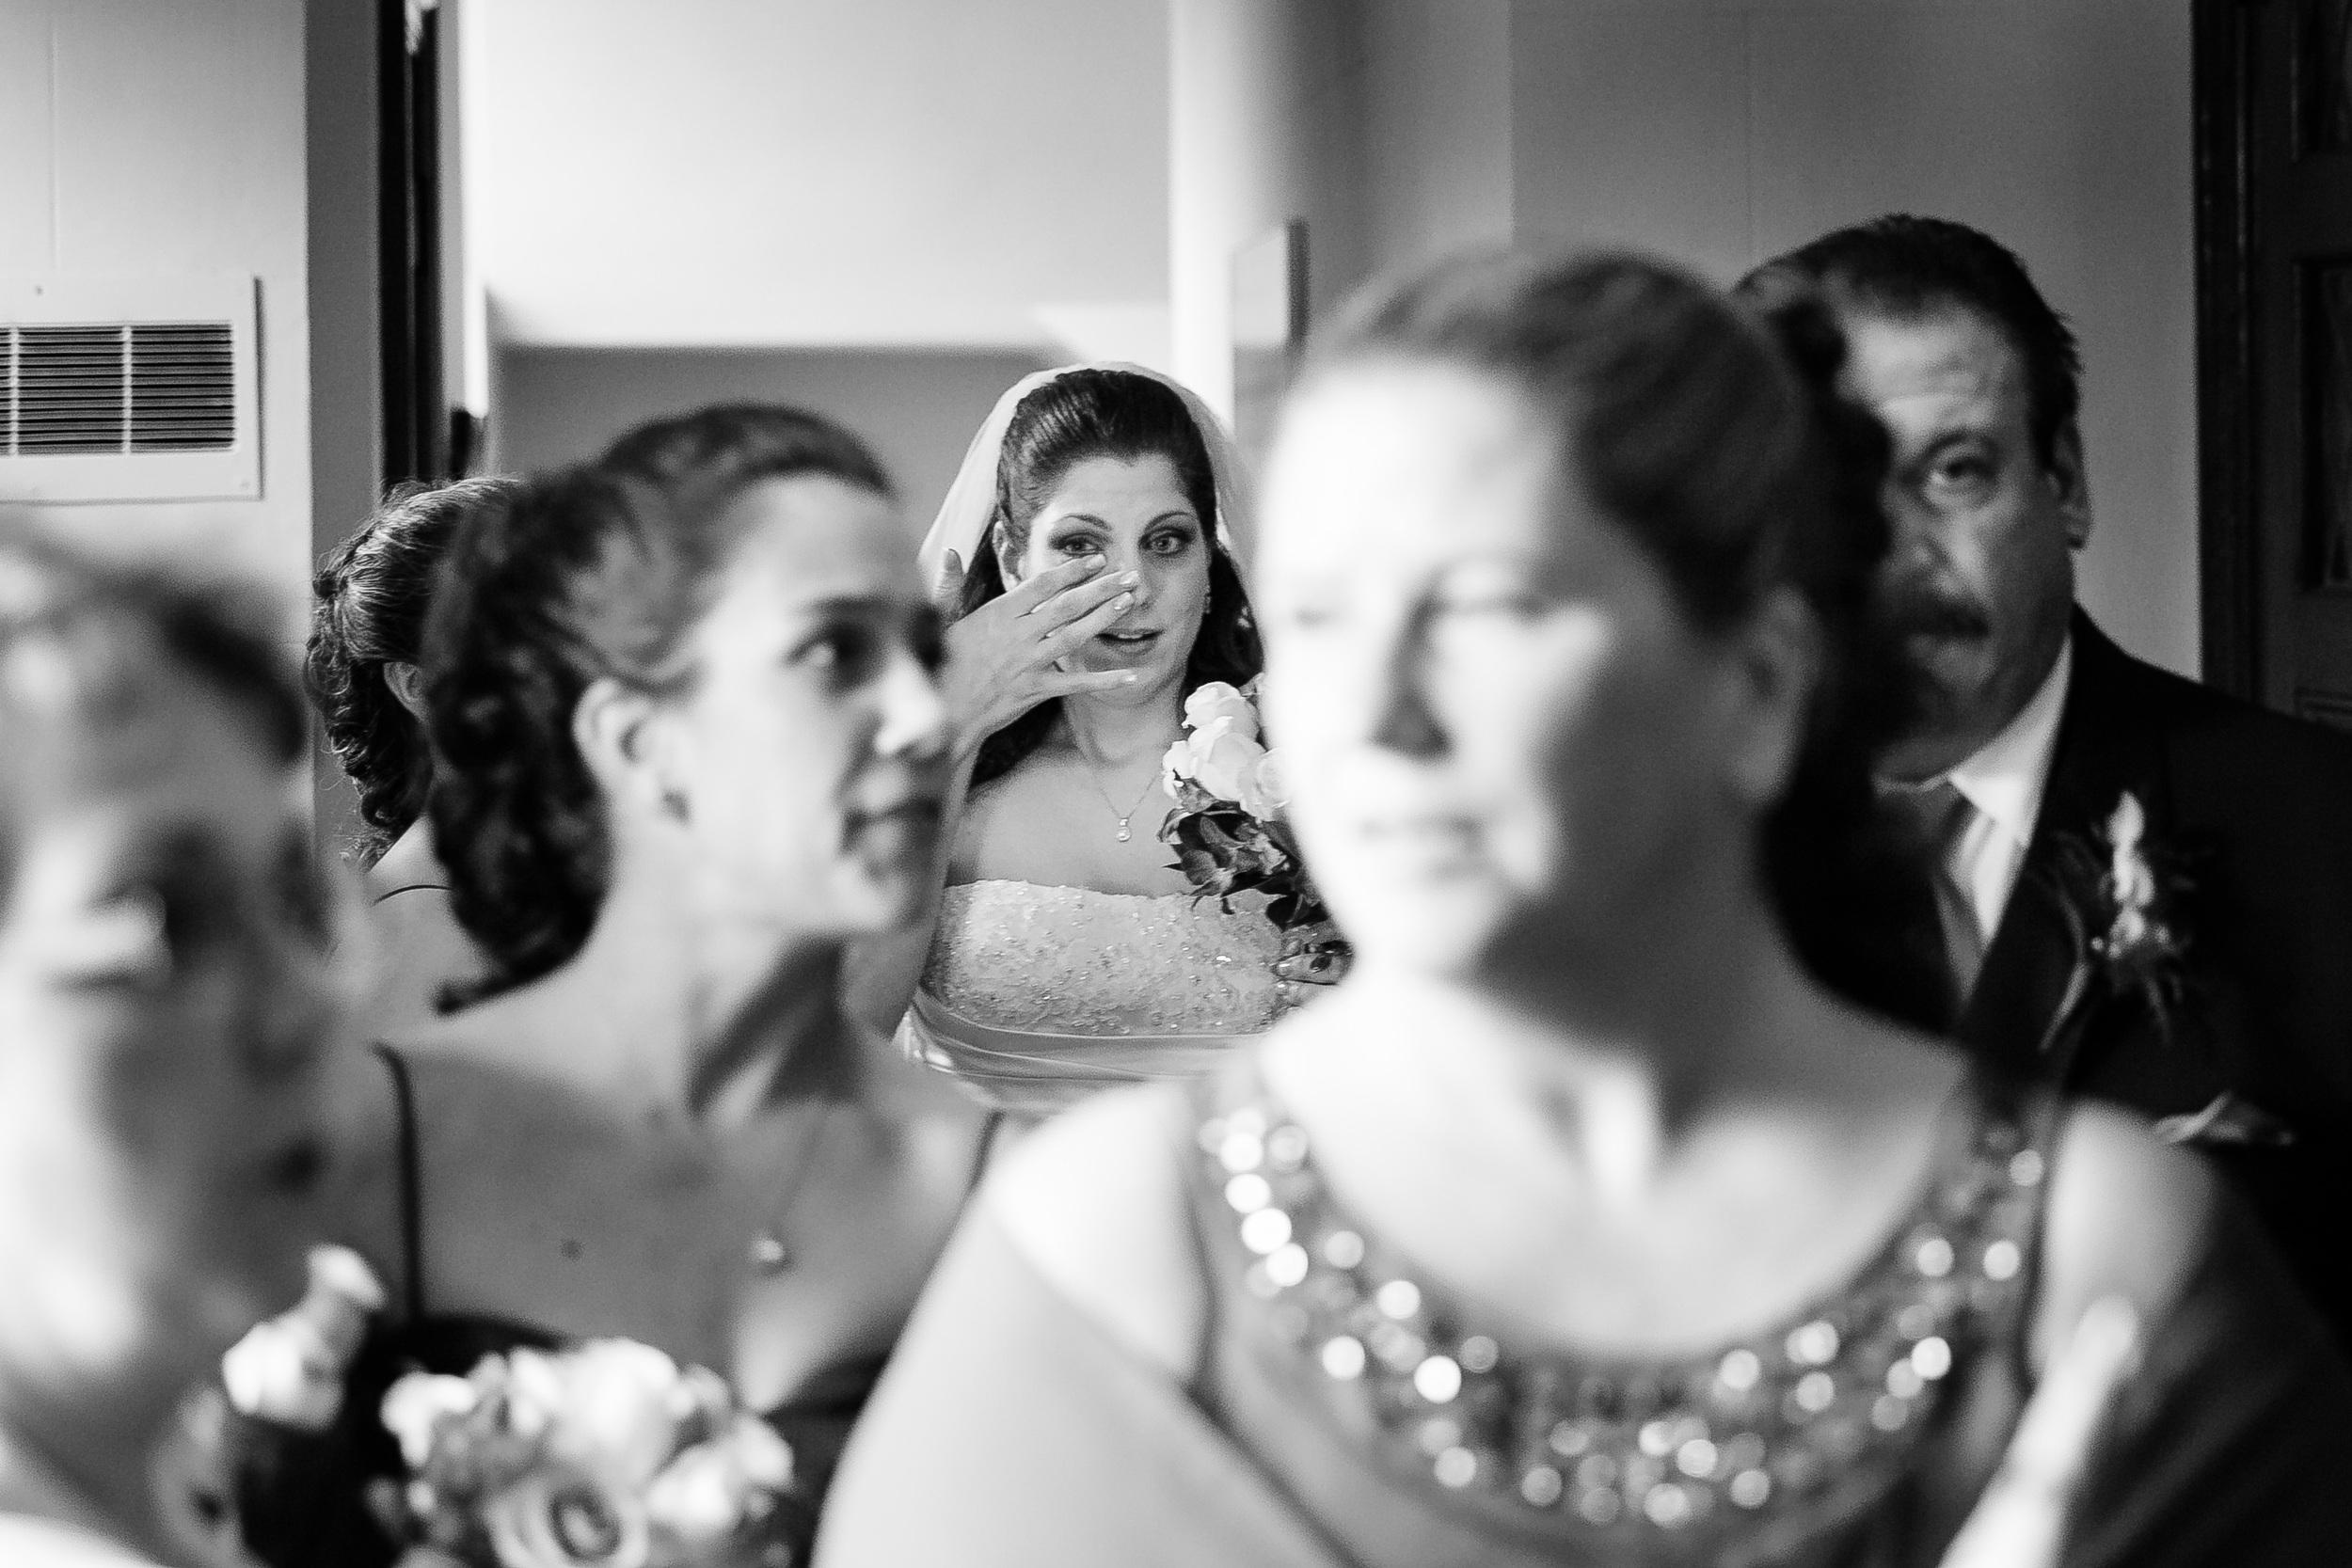 Italian-Wedding-La-Bella-Vista-Waterbury-CT-Photojournalistic-Photography-by-Jacek-Dolata.jpg